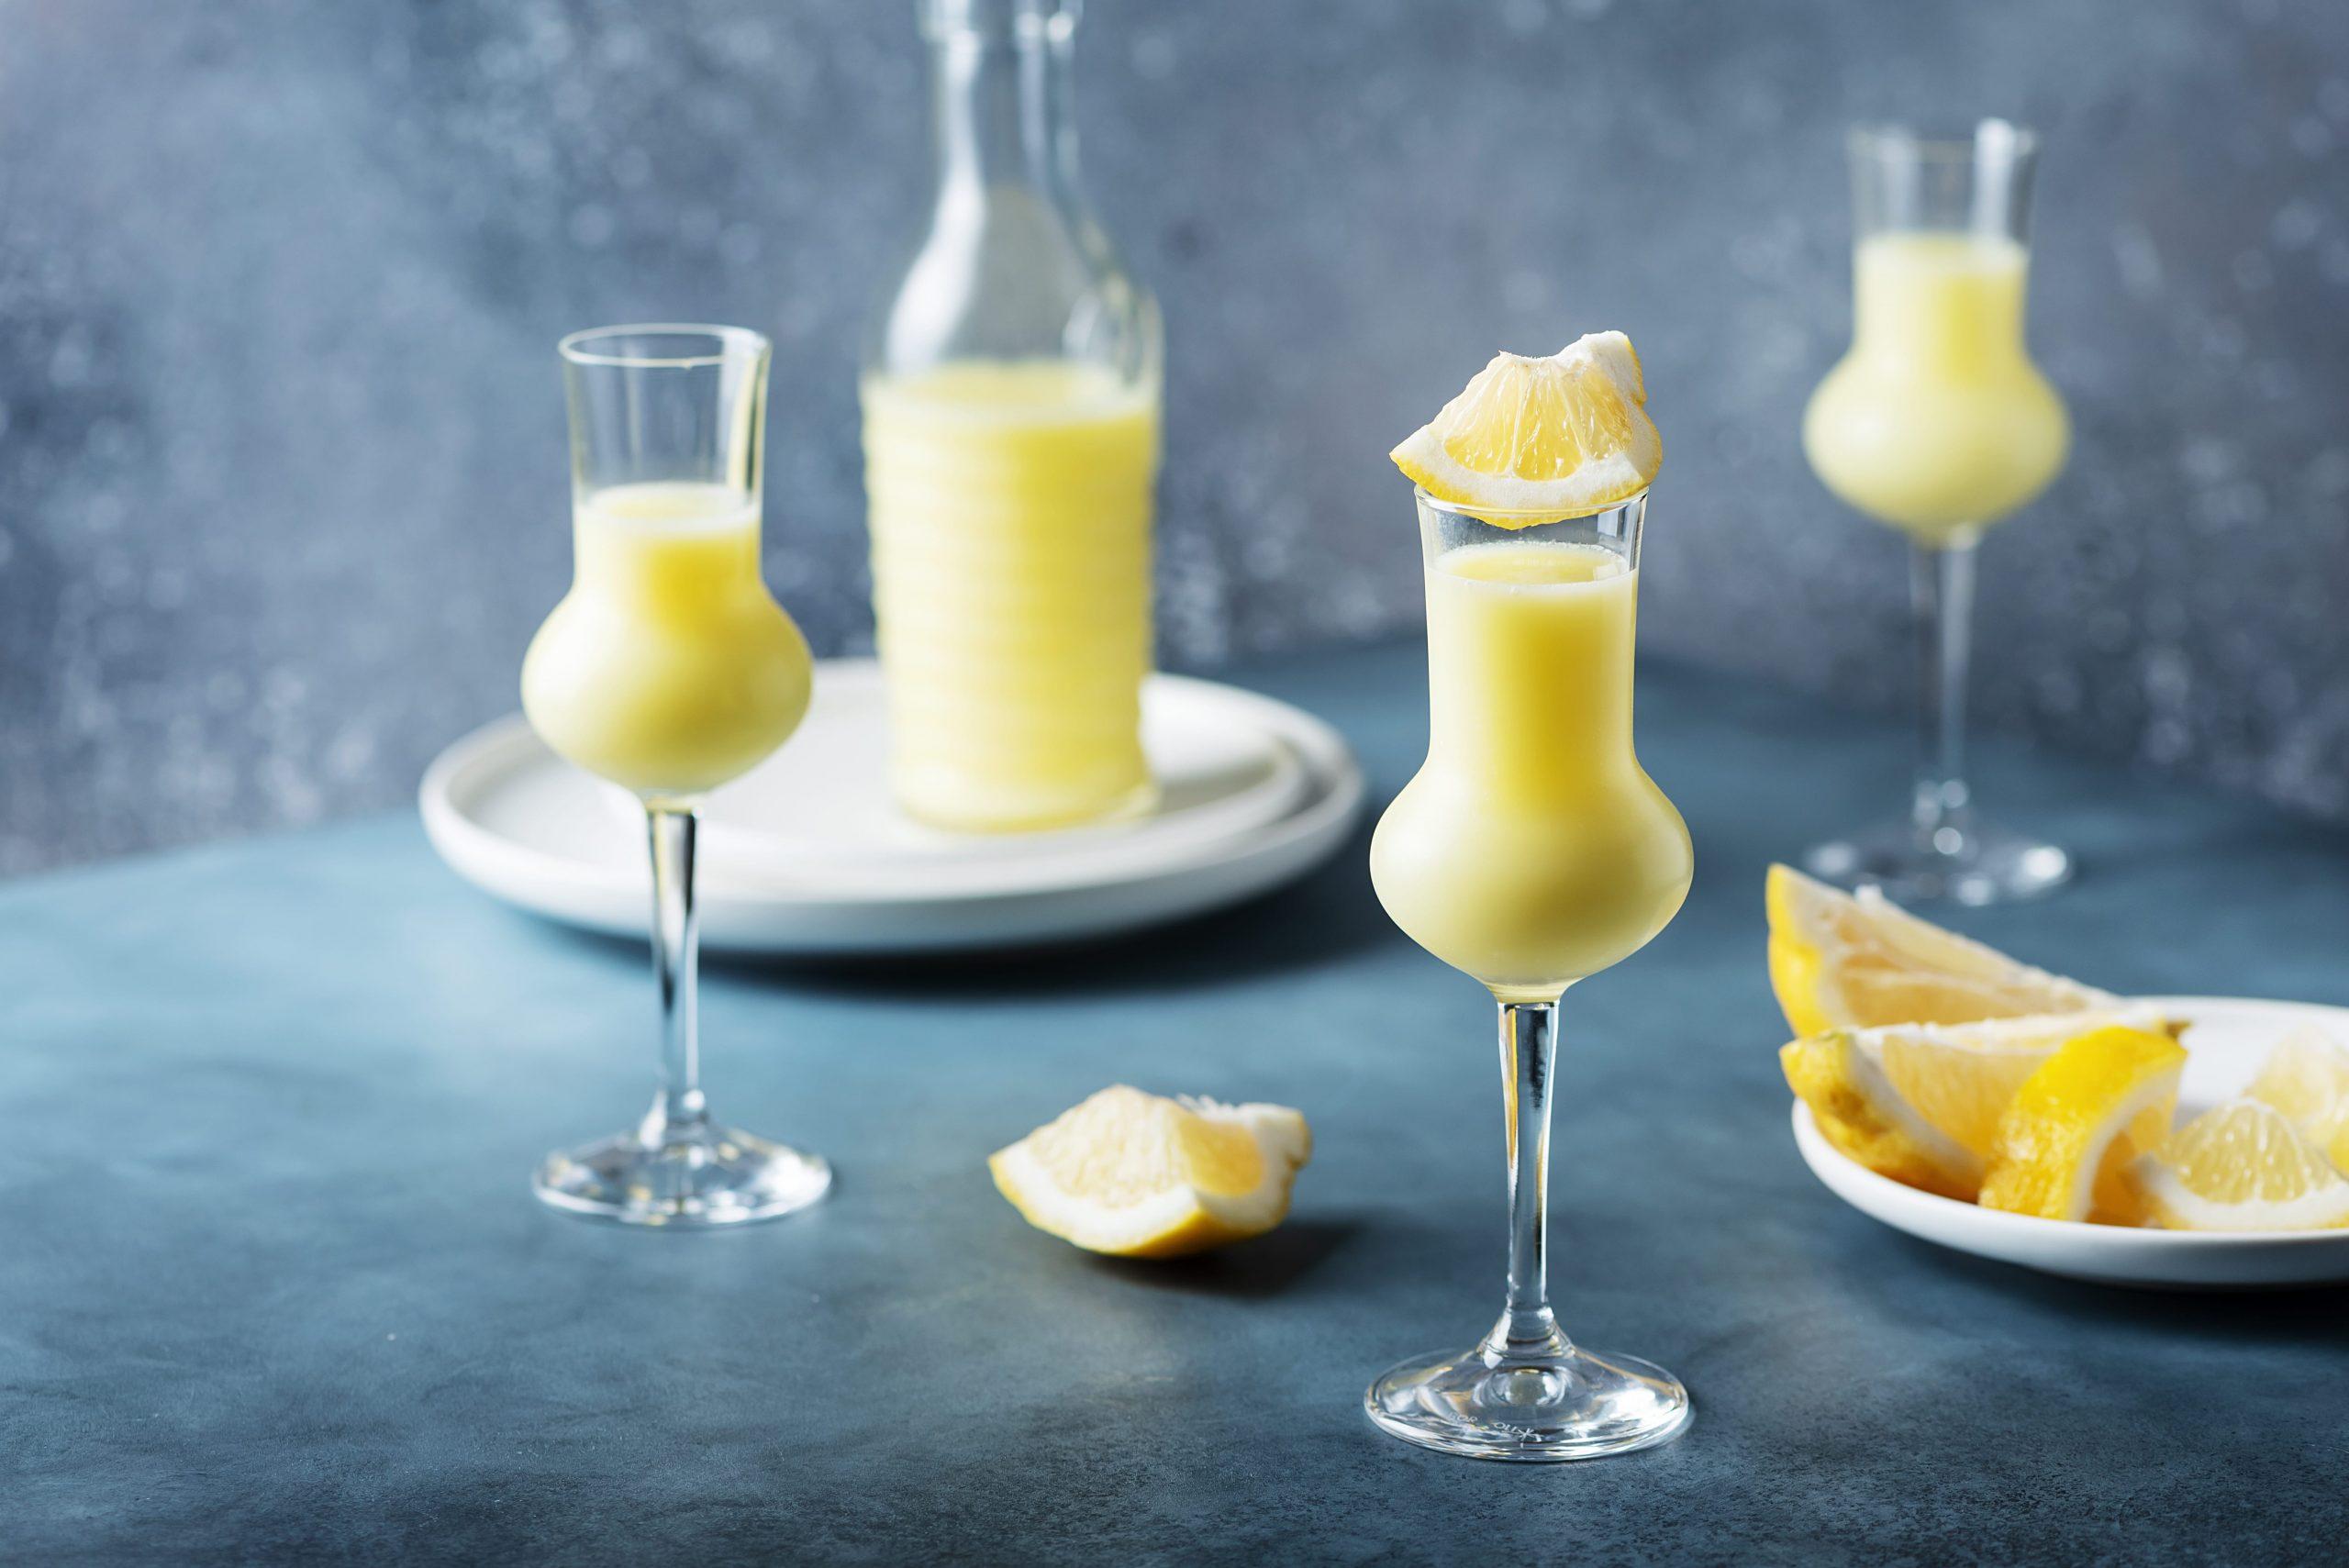 Sgroppino al Limone Cocktail Recept